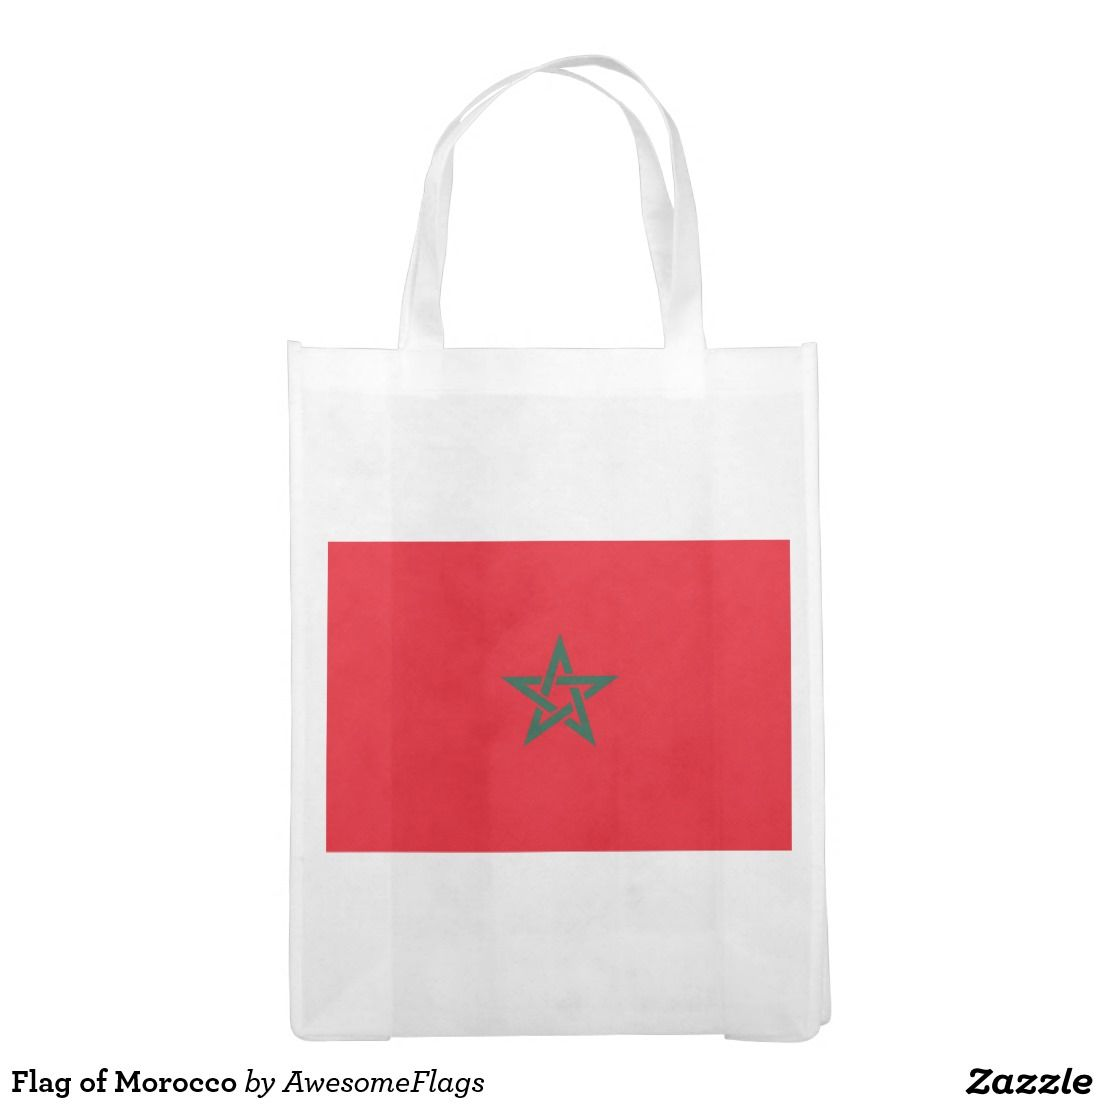 Flag Of Morocco Reusable Grocery Bag Zazzle Co Uk Reusable Grocery Bags Bags Flag